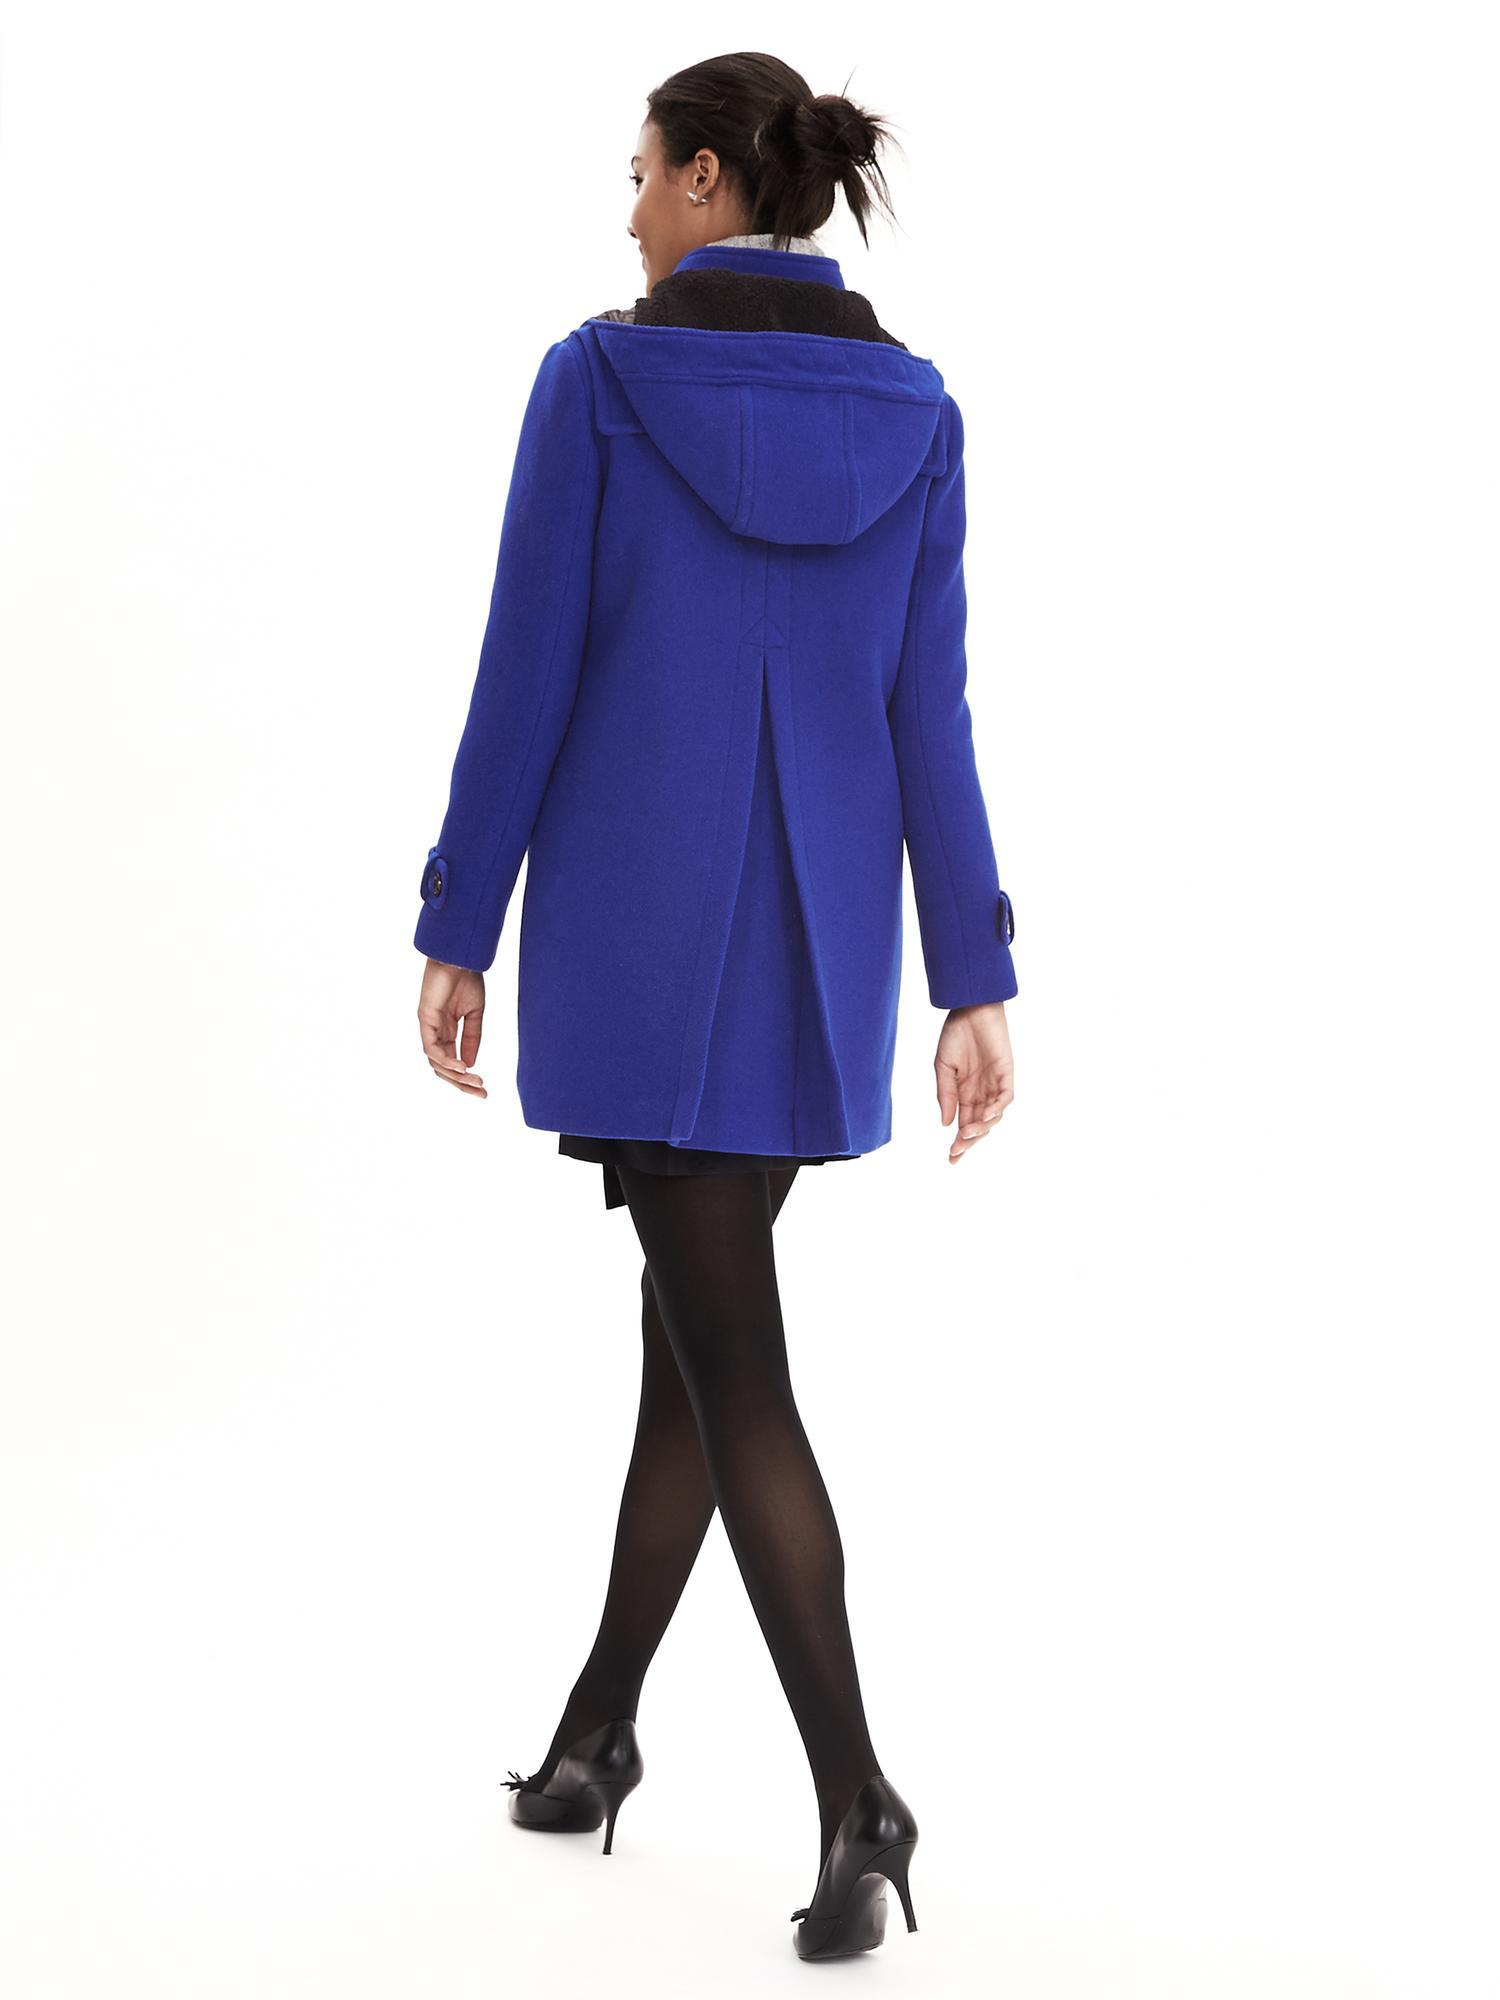 banana republic blue duffle coat in blue dreamy royal lyst. Black Bedroom Furniture Sets. Home Design Ideas